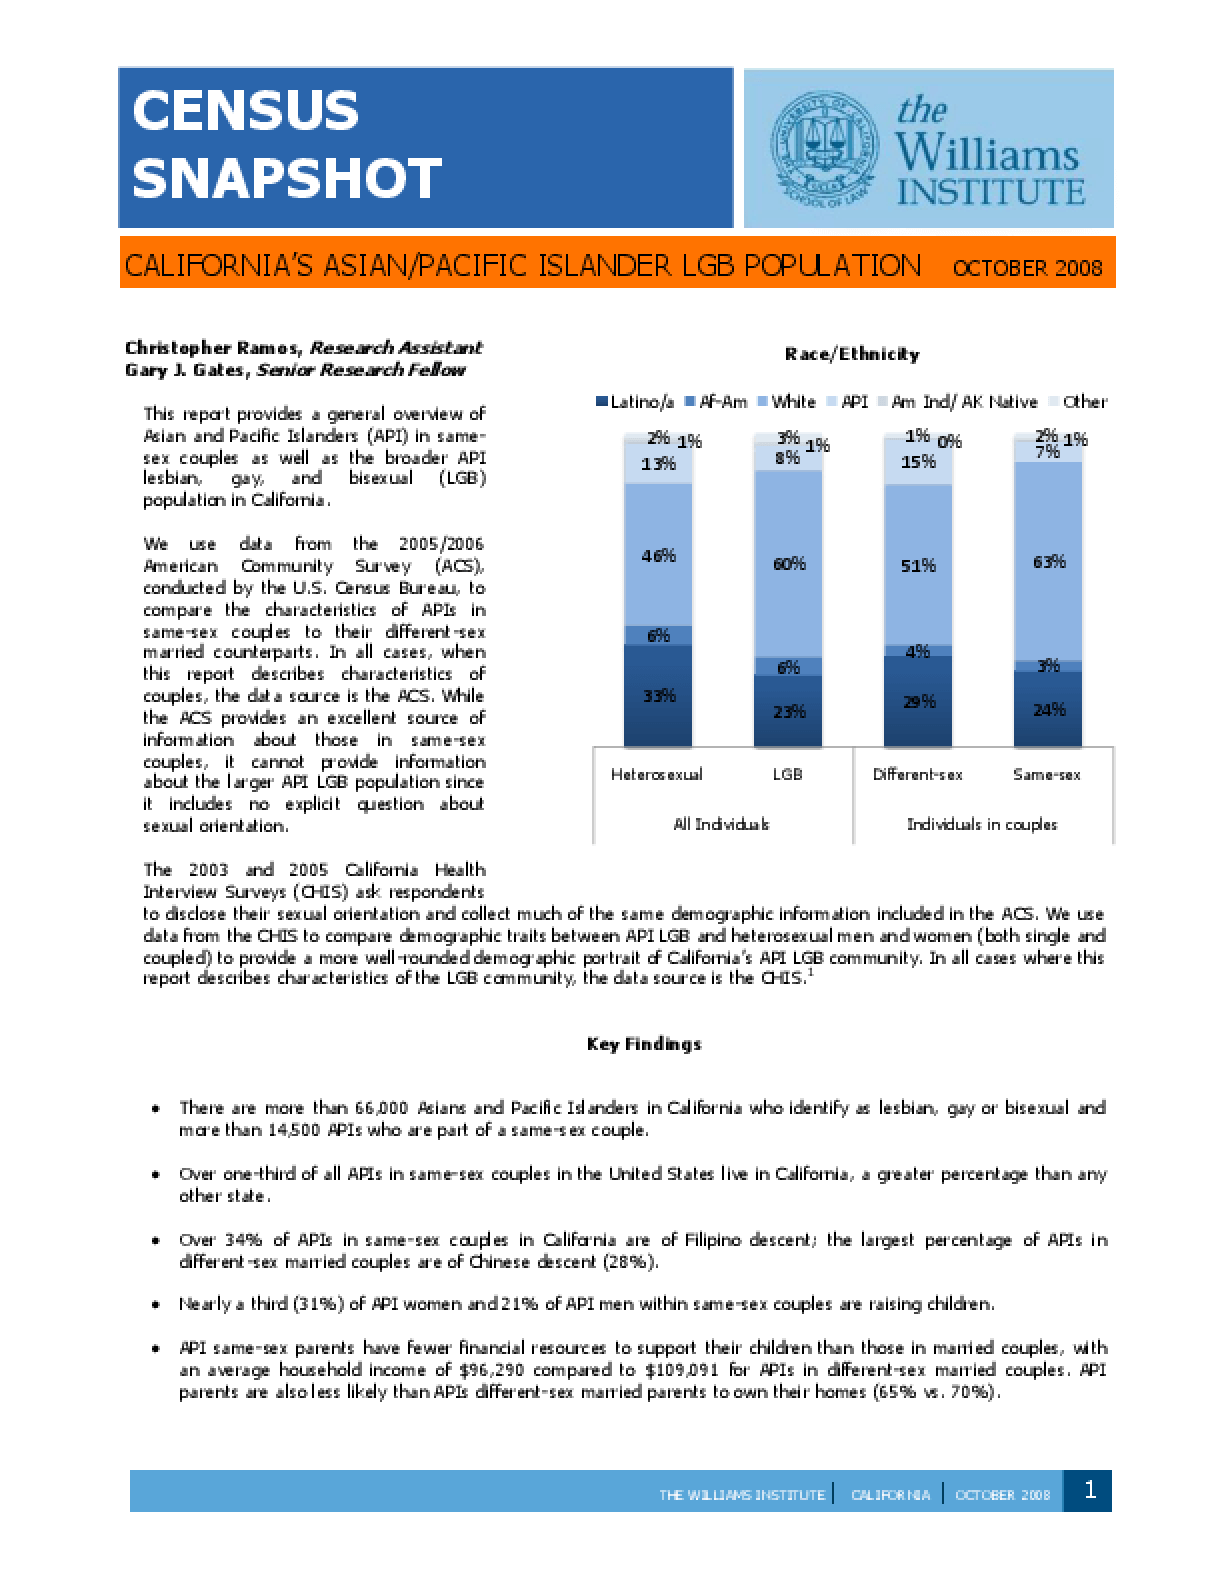 Census Snapshot: California's Asian/Pacific Islander LGB Population